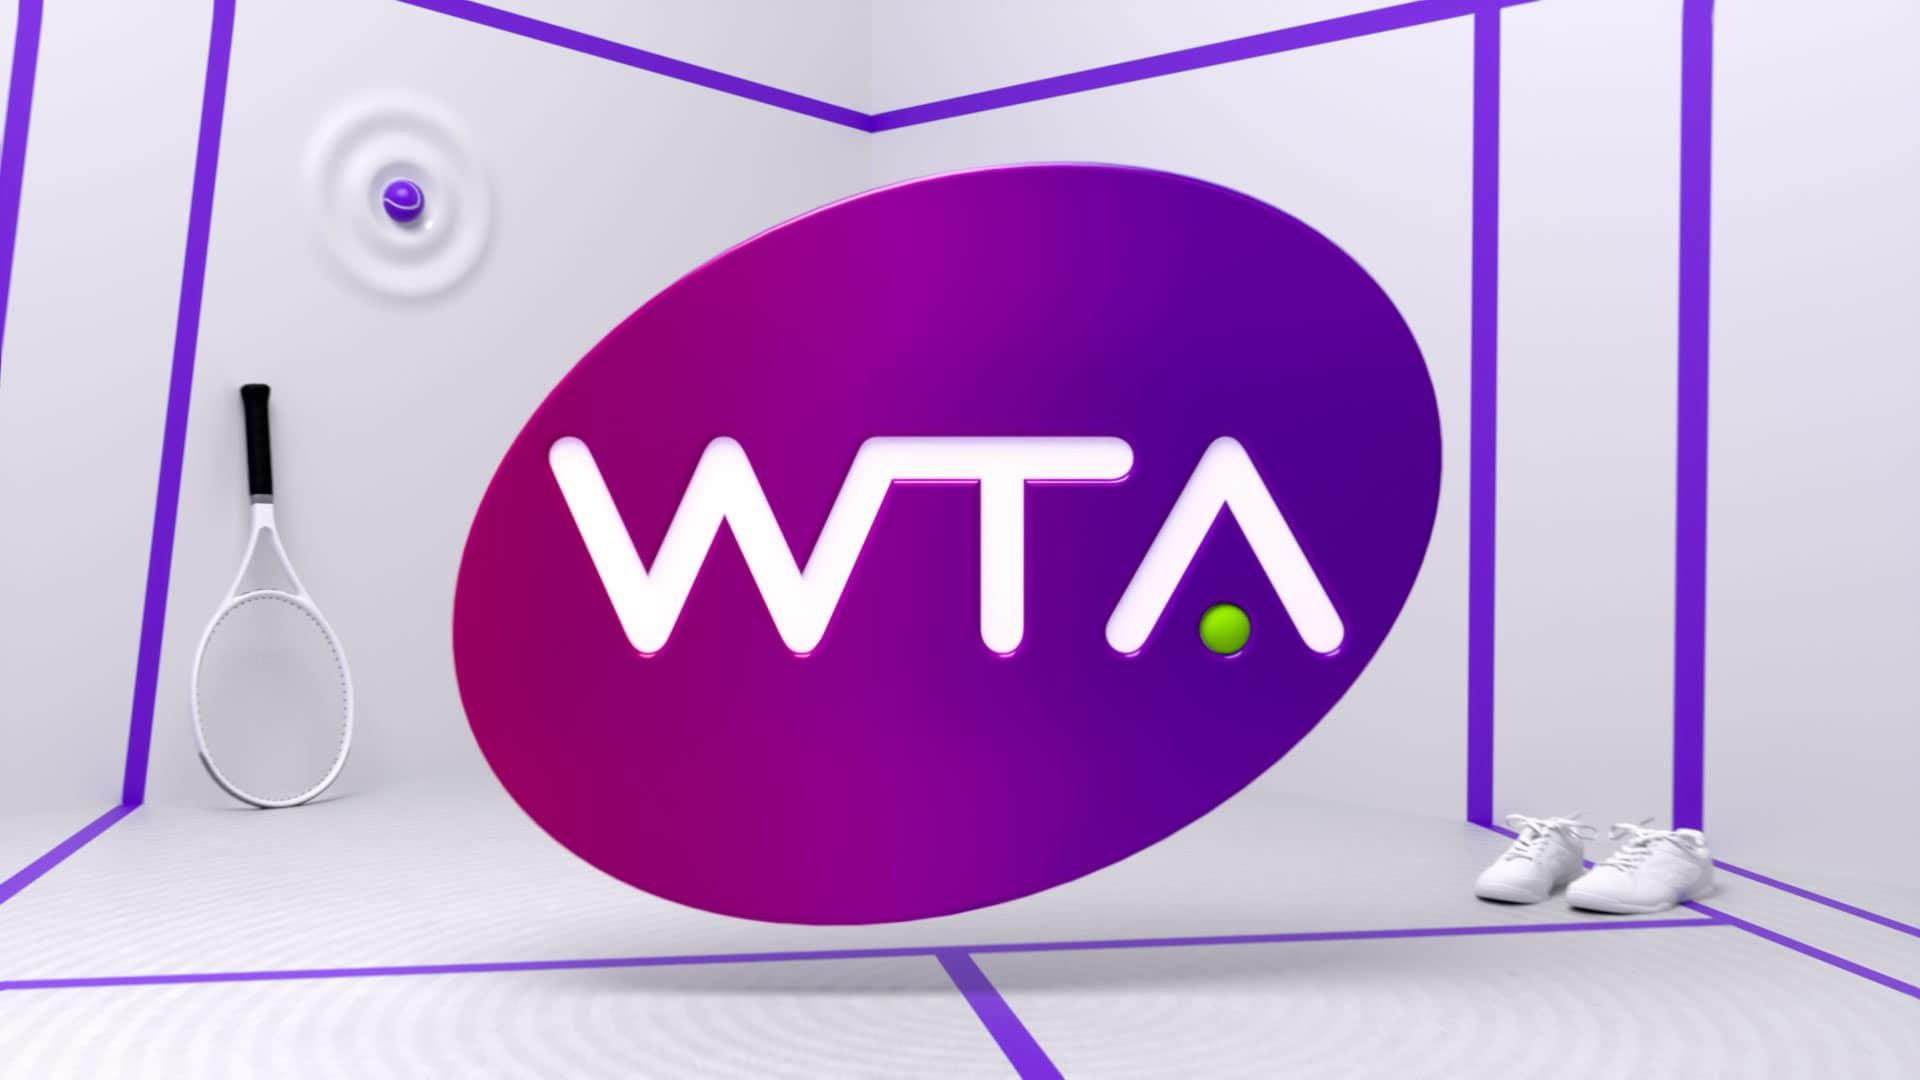 2020 WTA Rebranding Girraphic 1